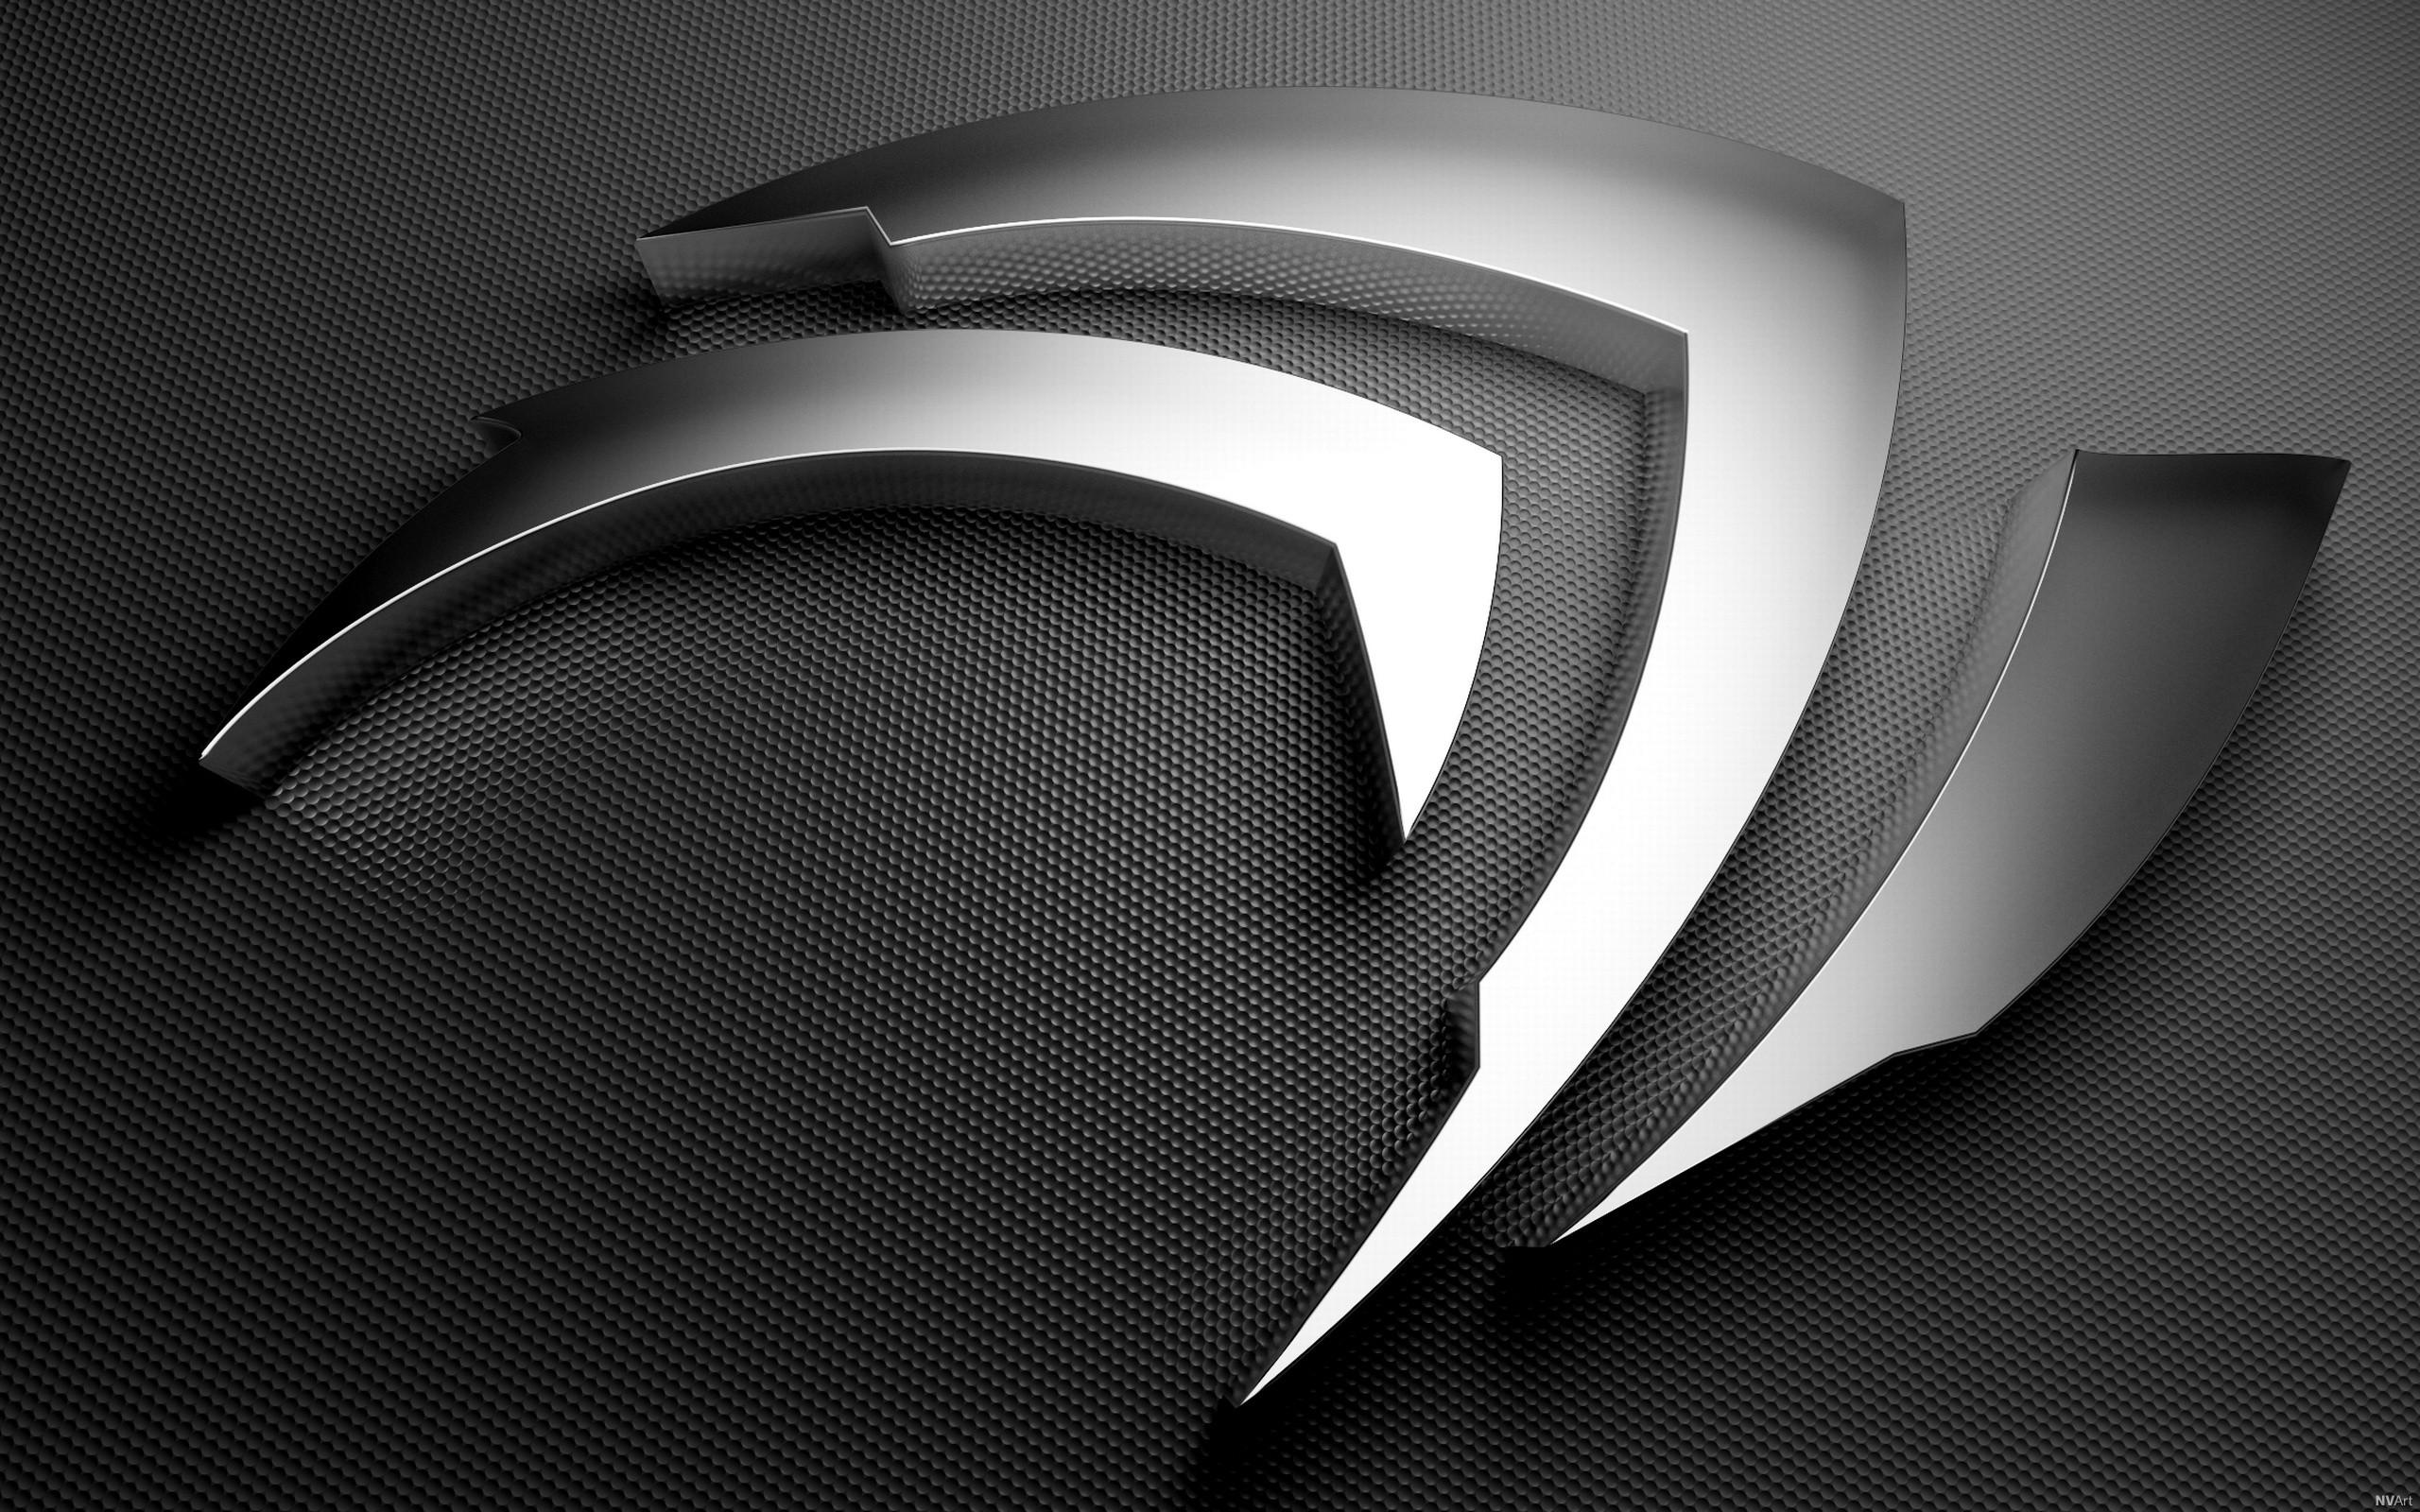 nvidia hd wallpaper background image 2560x1600 id